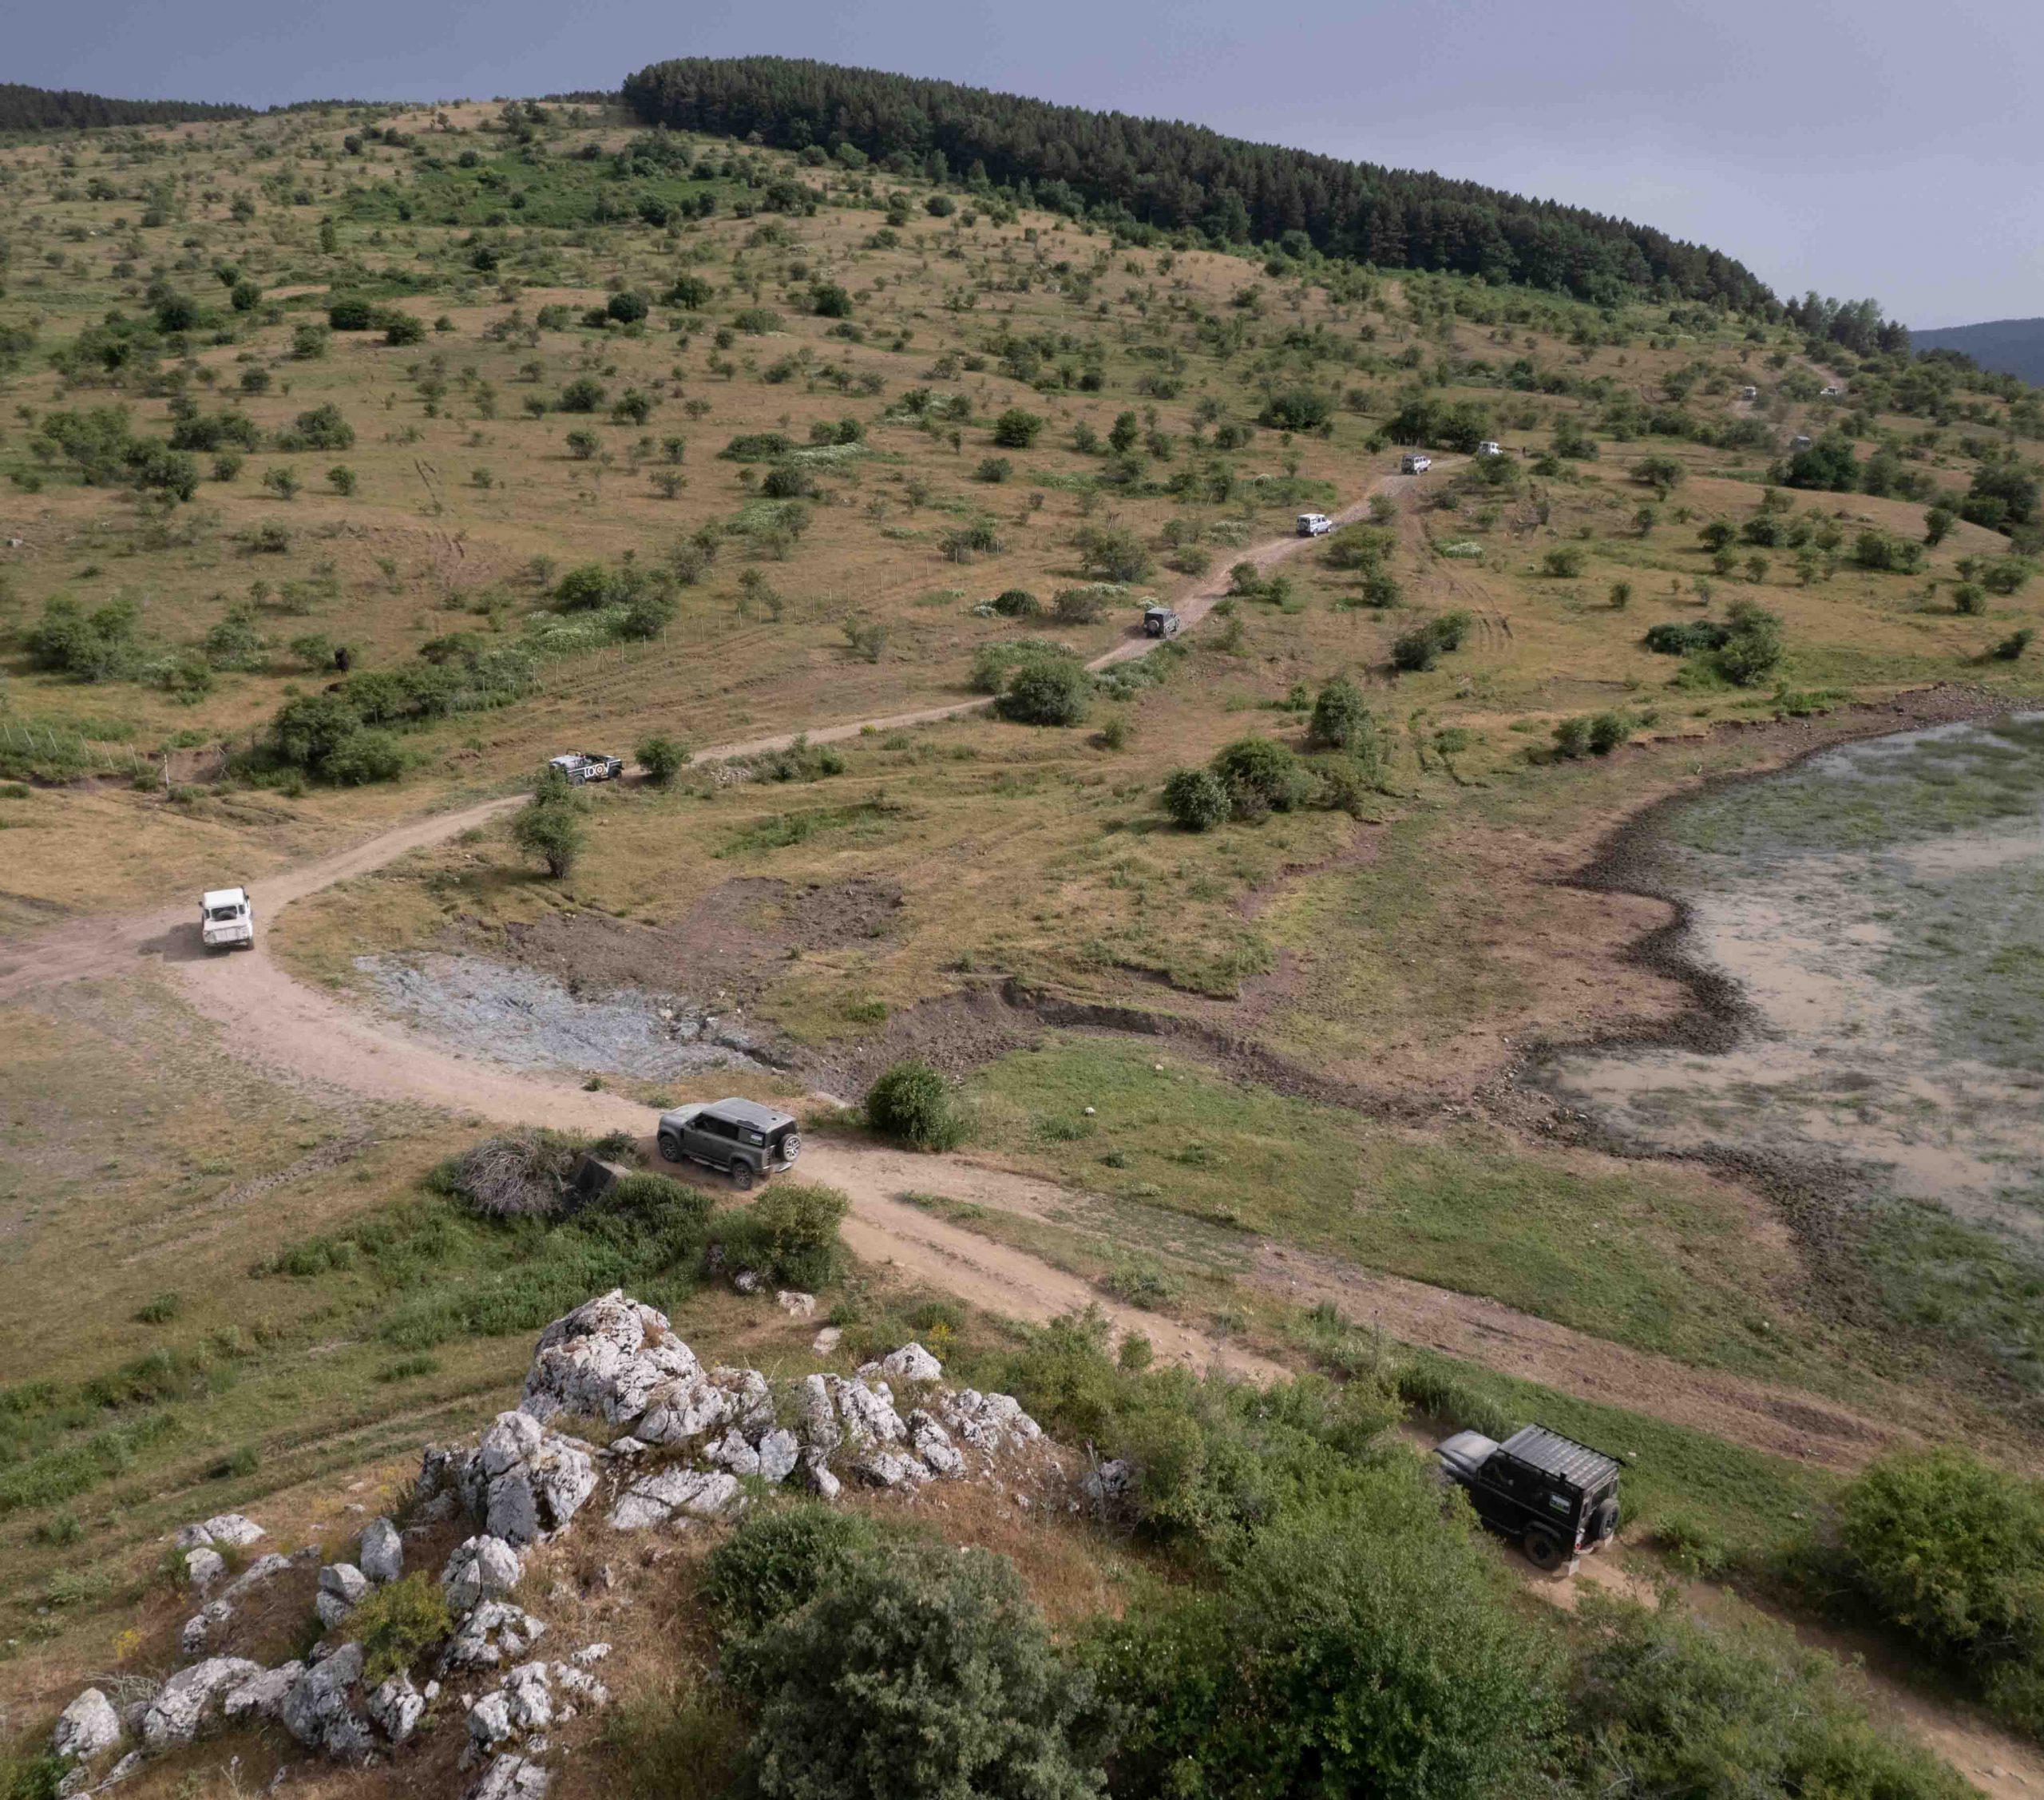 Land_Rover_Tour_Sicilia_2021_Land_Rover_Experience_Italia_-85